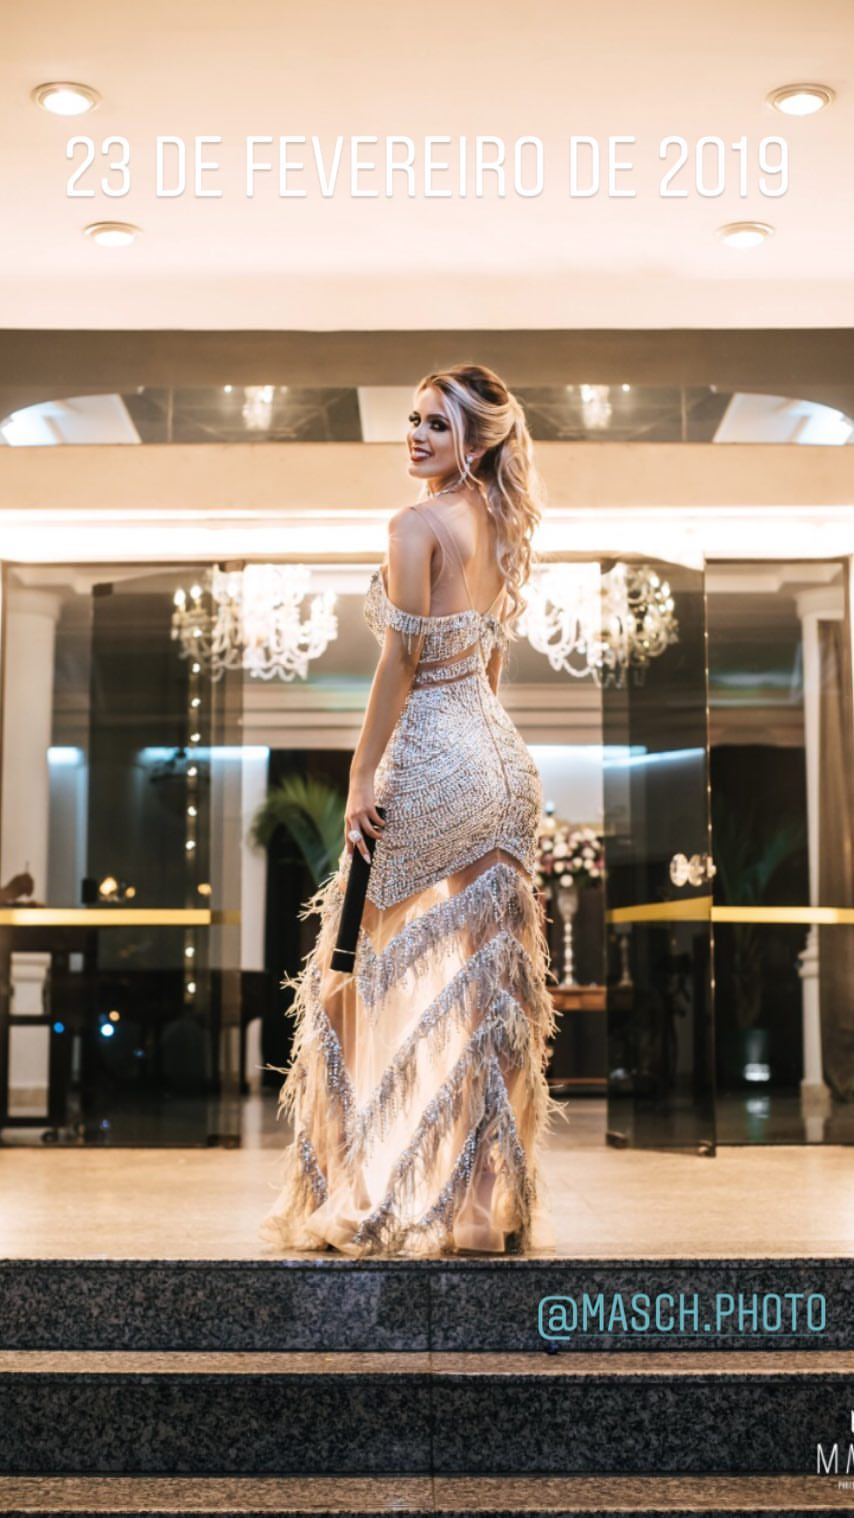 taina laydner, miss eco brasil 2019. - Página 5 53398511